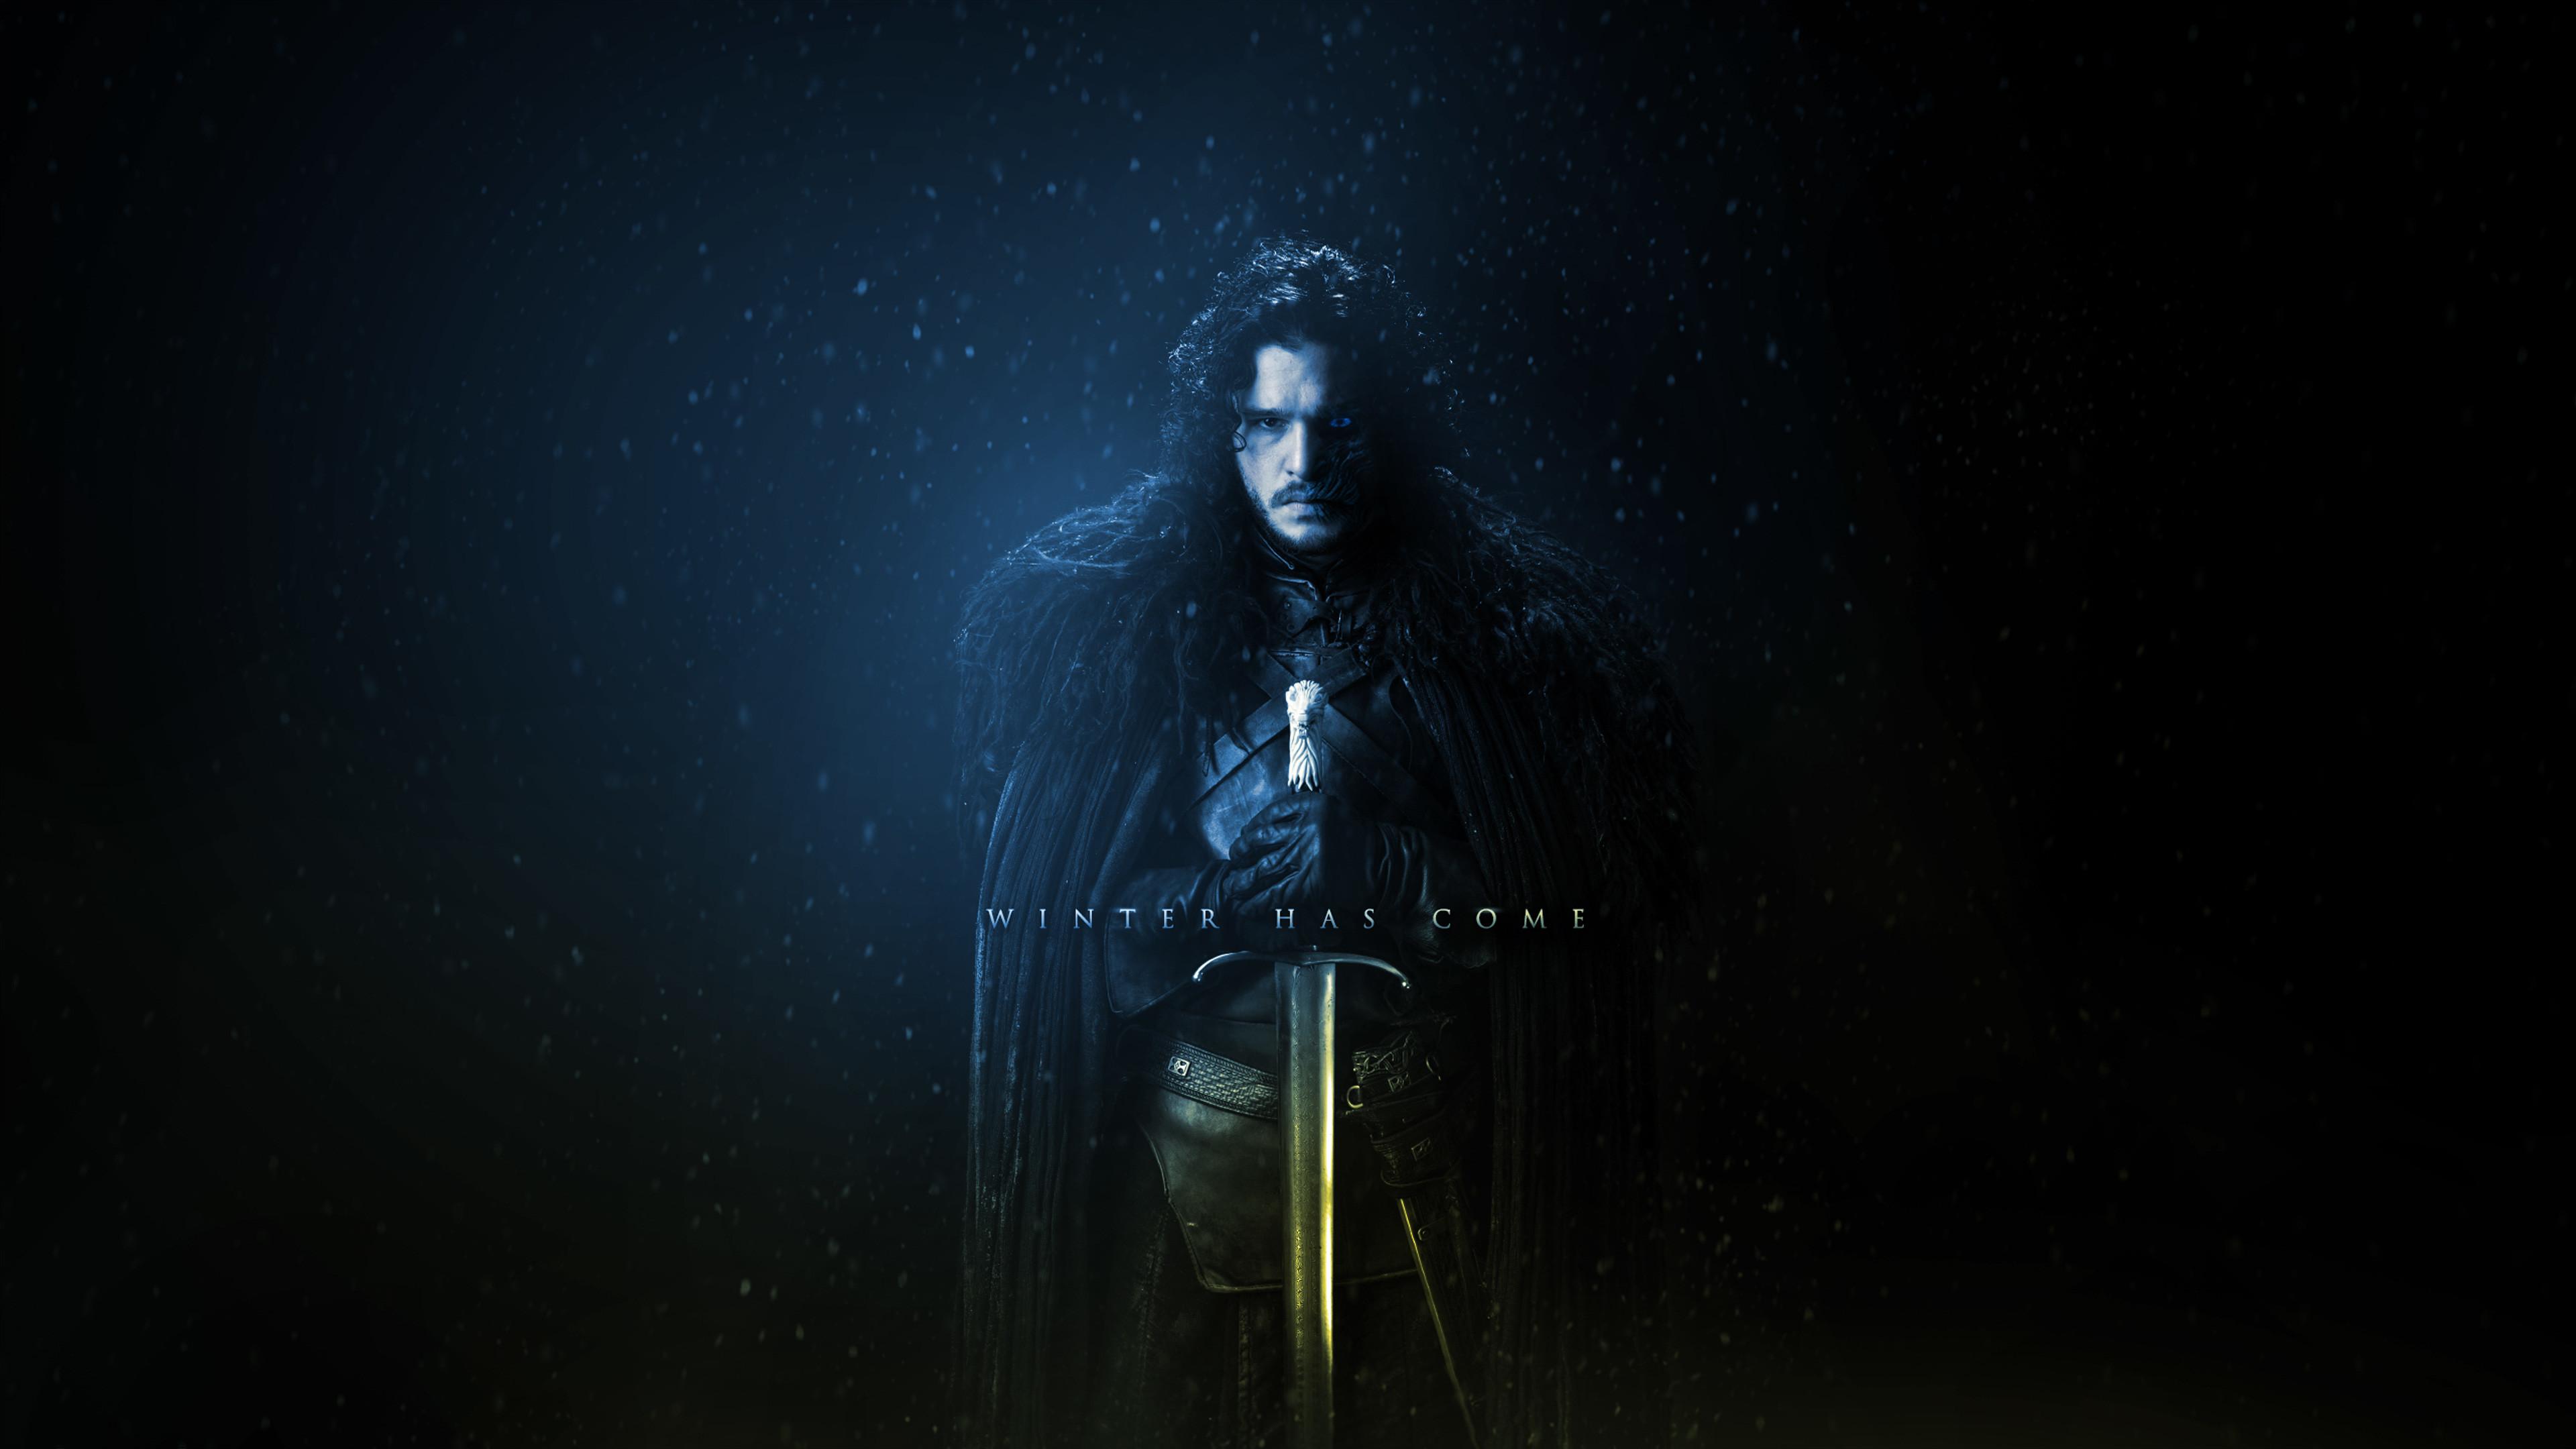 Game of Thrones Season 7 Winter Has Come 4K